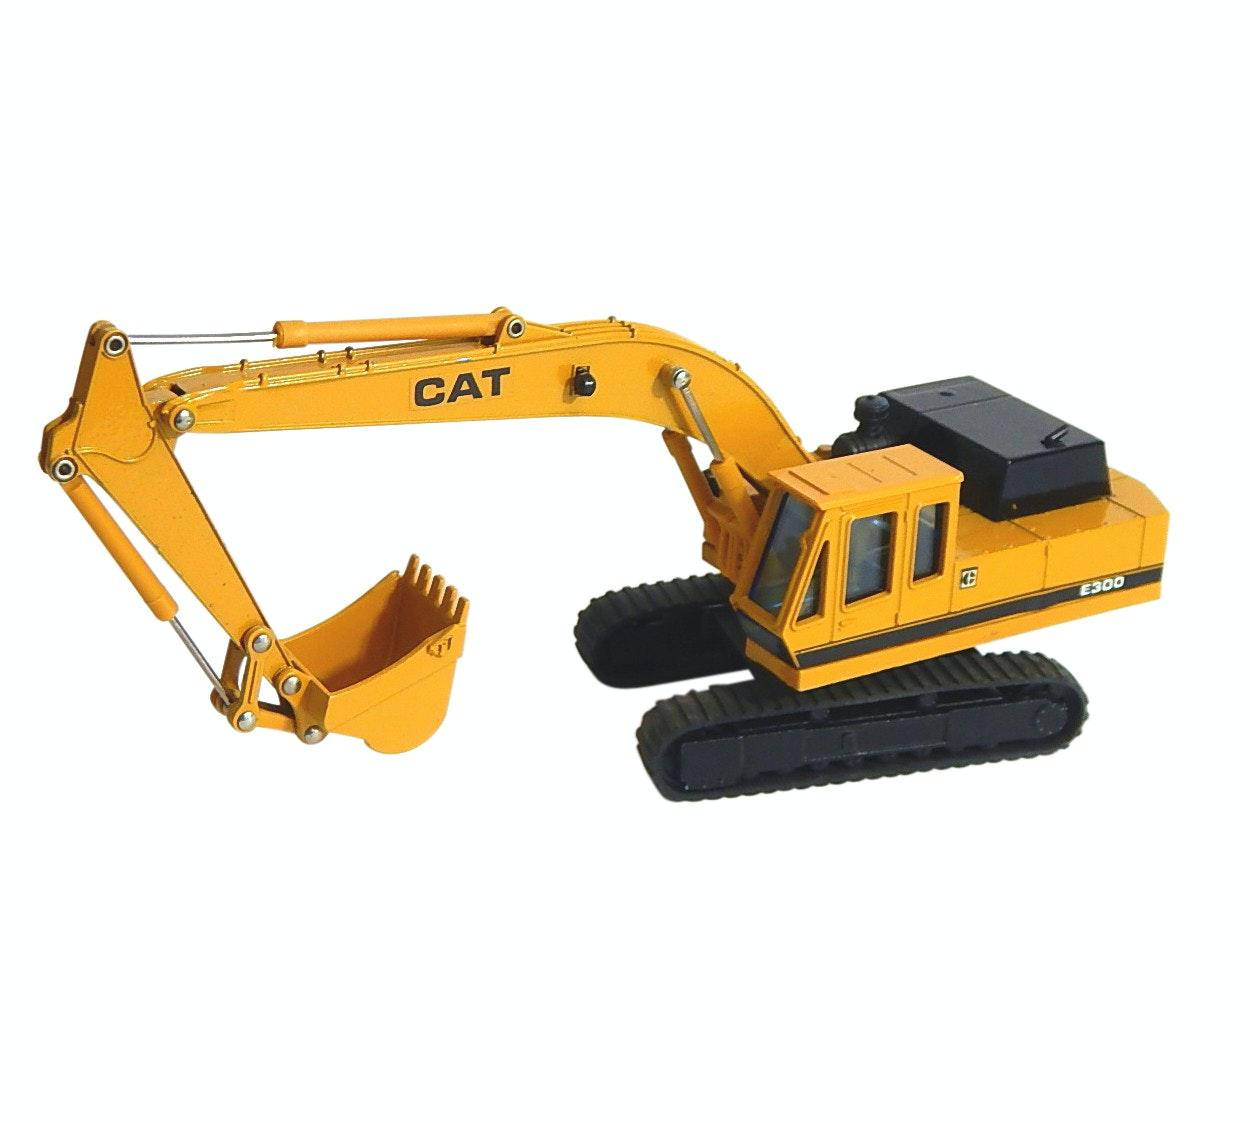 Die Cast Shinsei Caterpillar E300 Mini Power No. 606 Power Shovel Vehicle